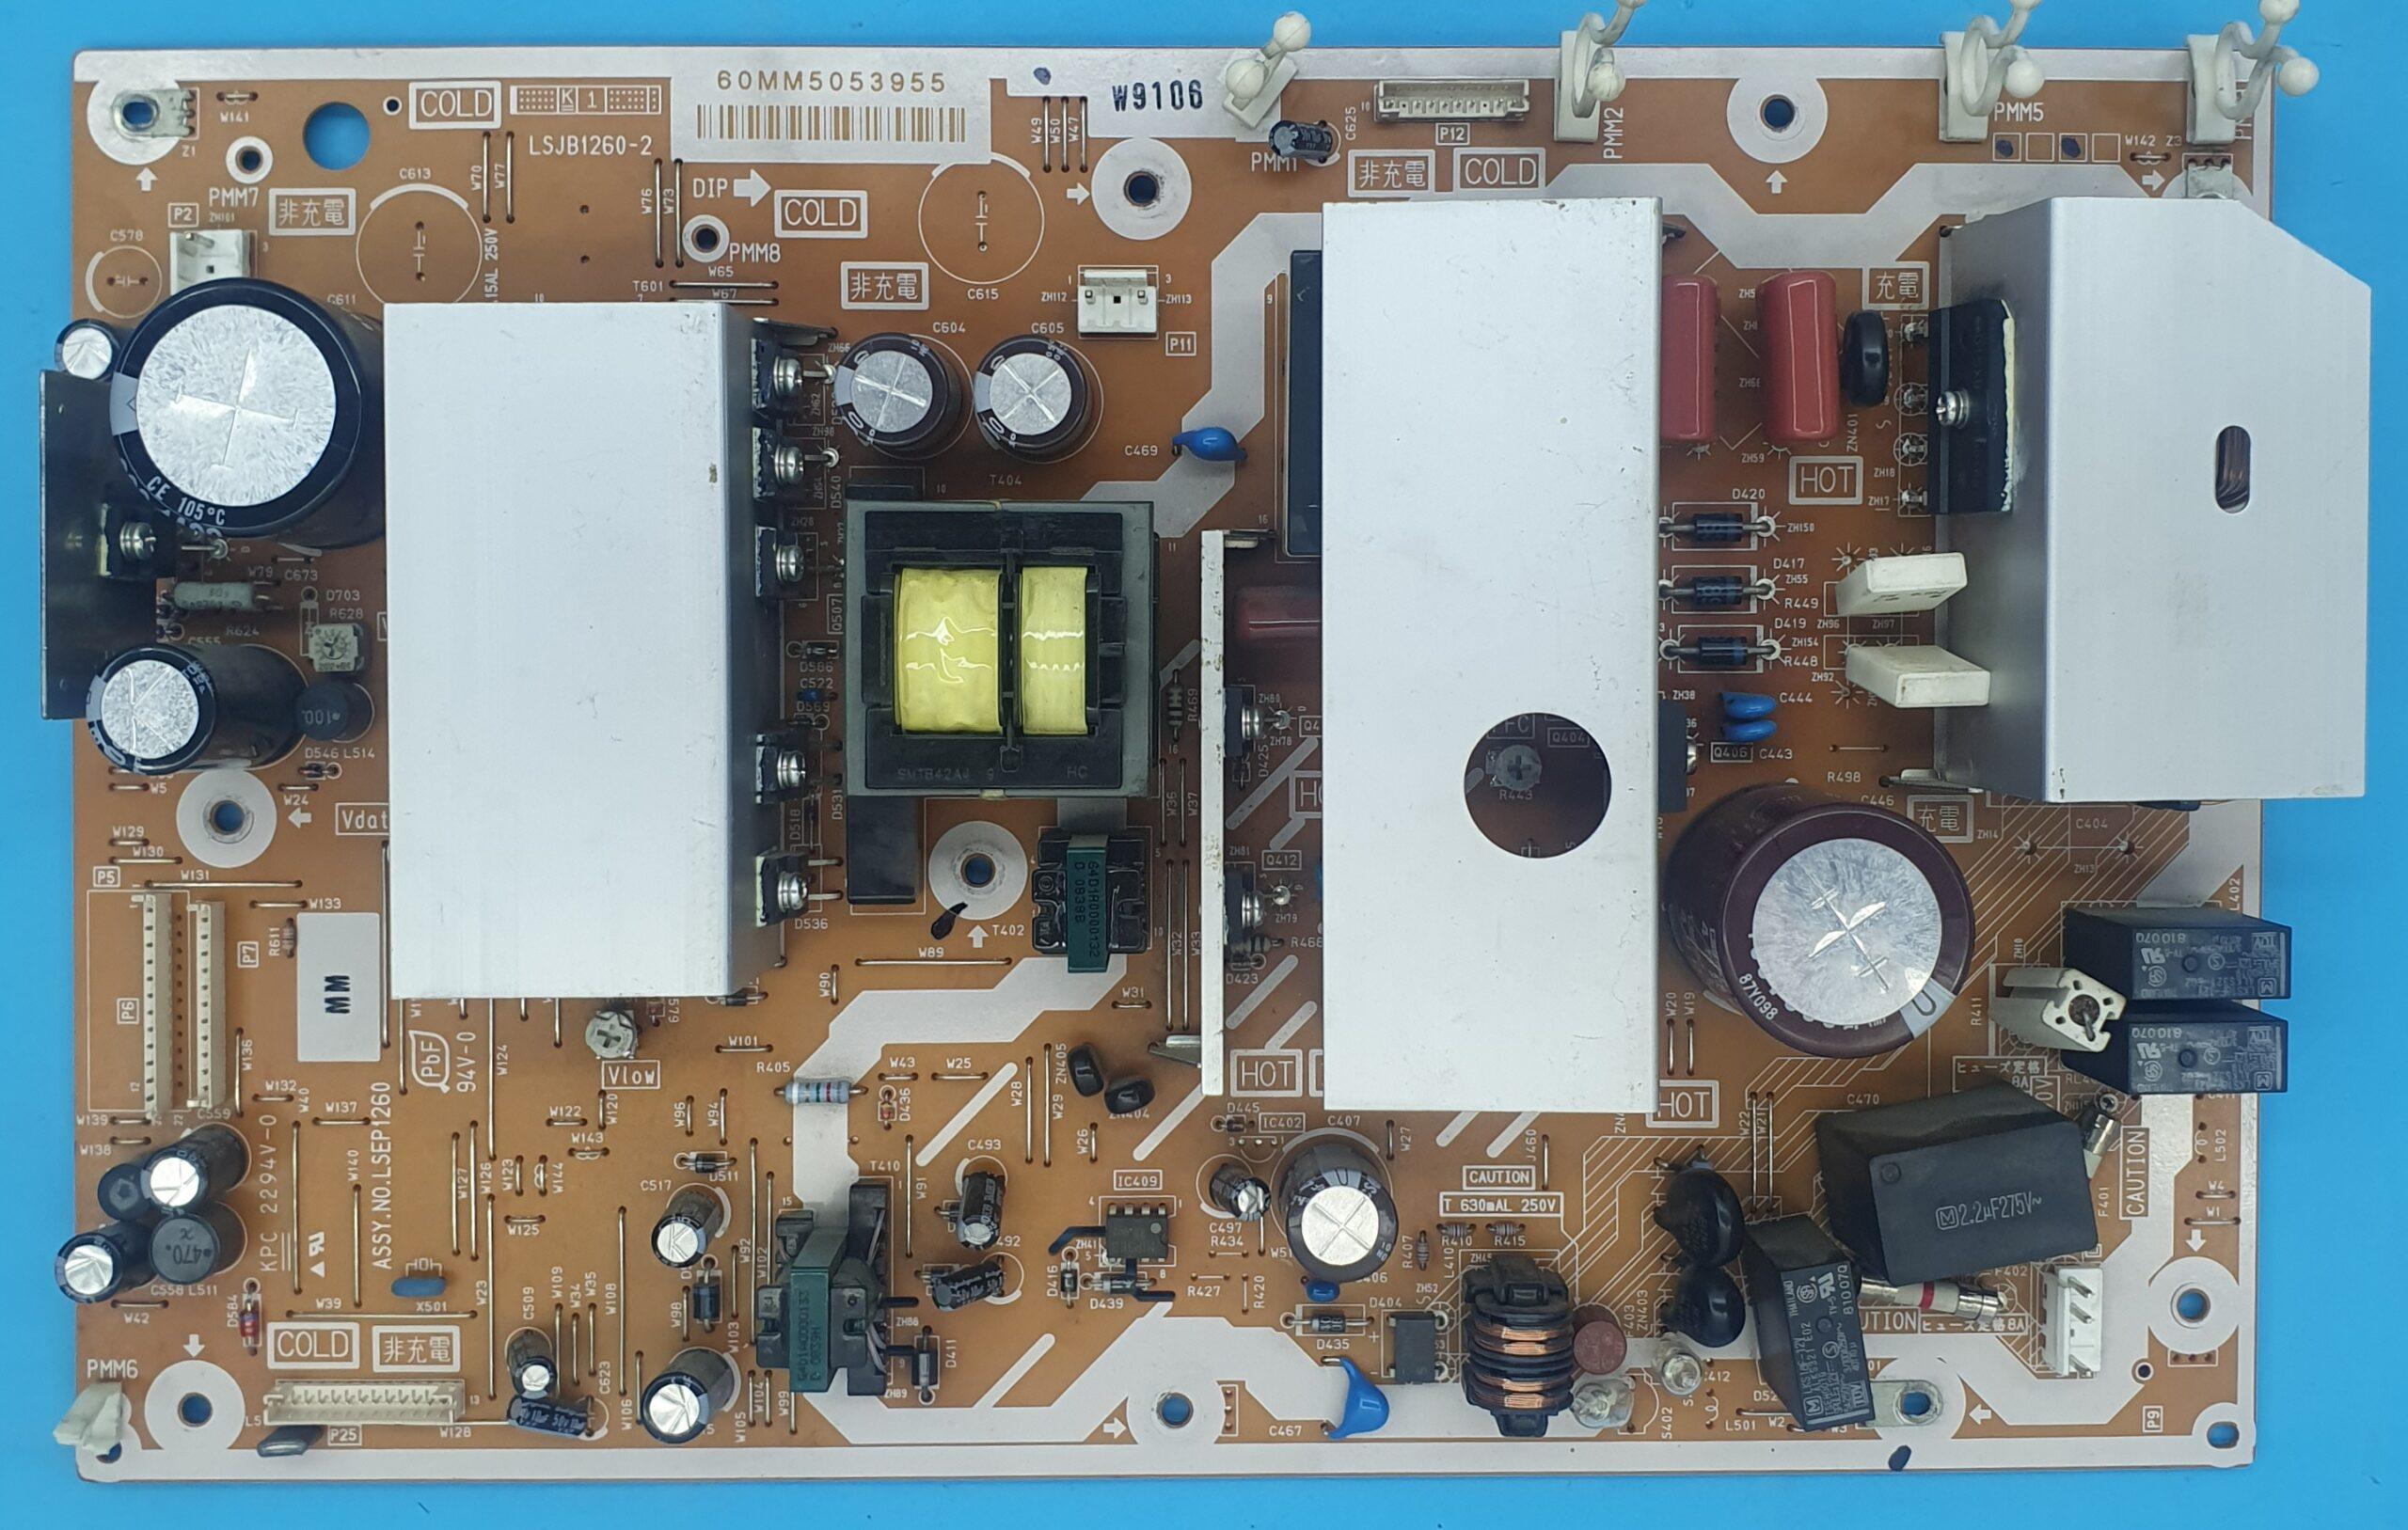 LSJB1260-2 Panasonic Power (KDV DAHİL = 200 TL)